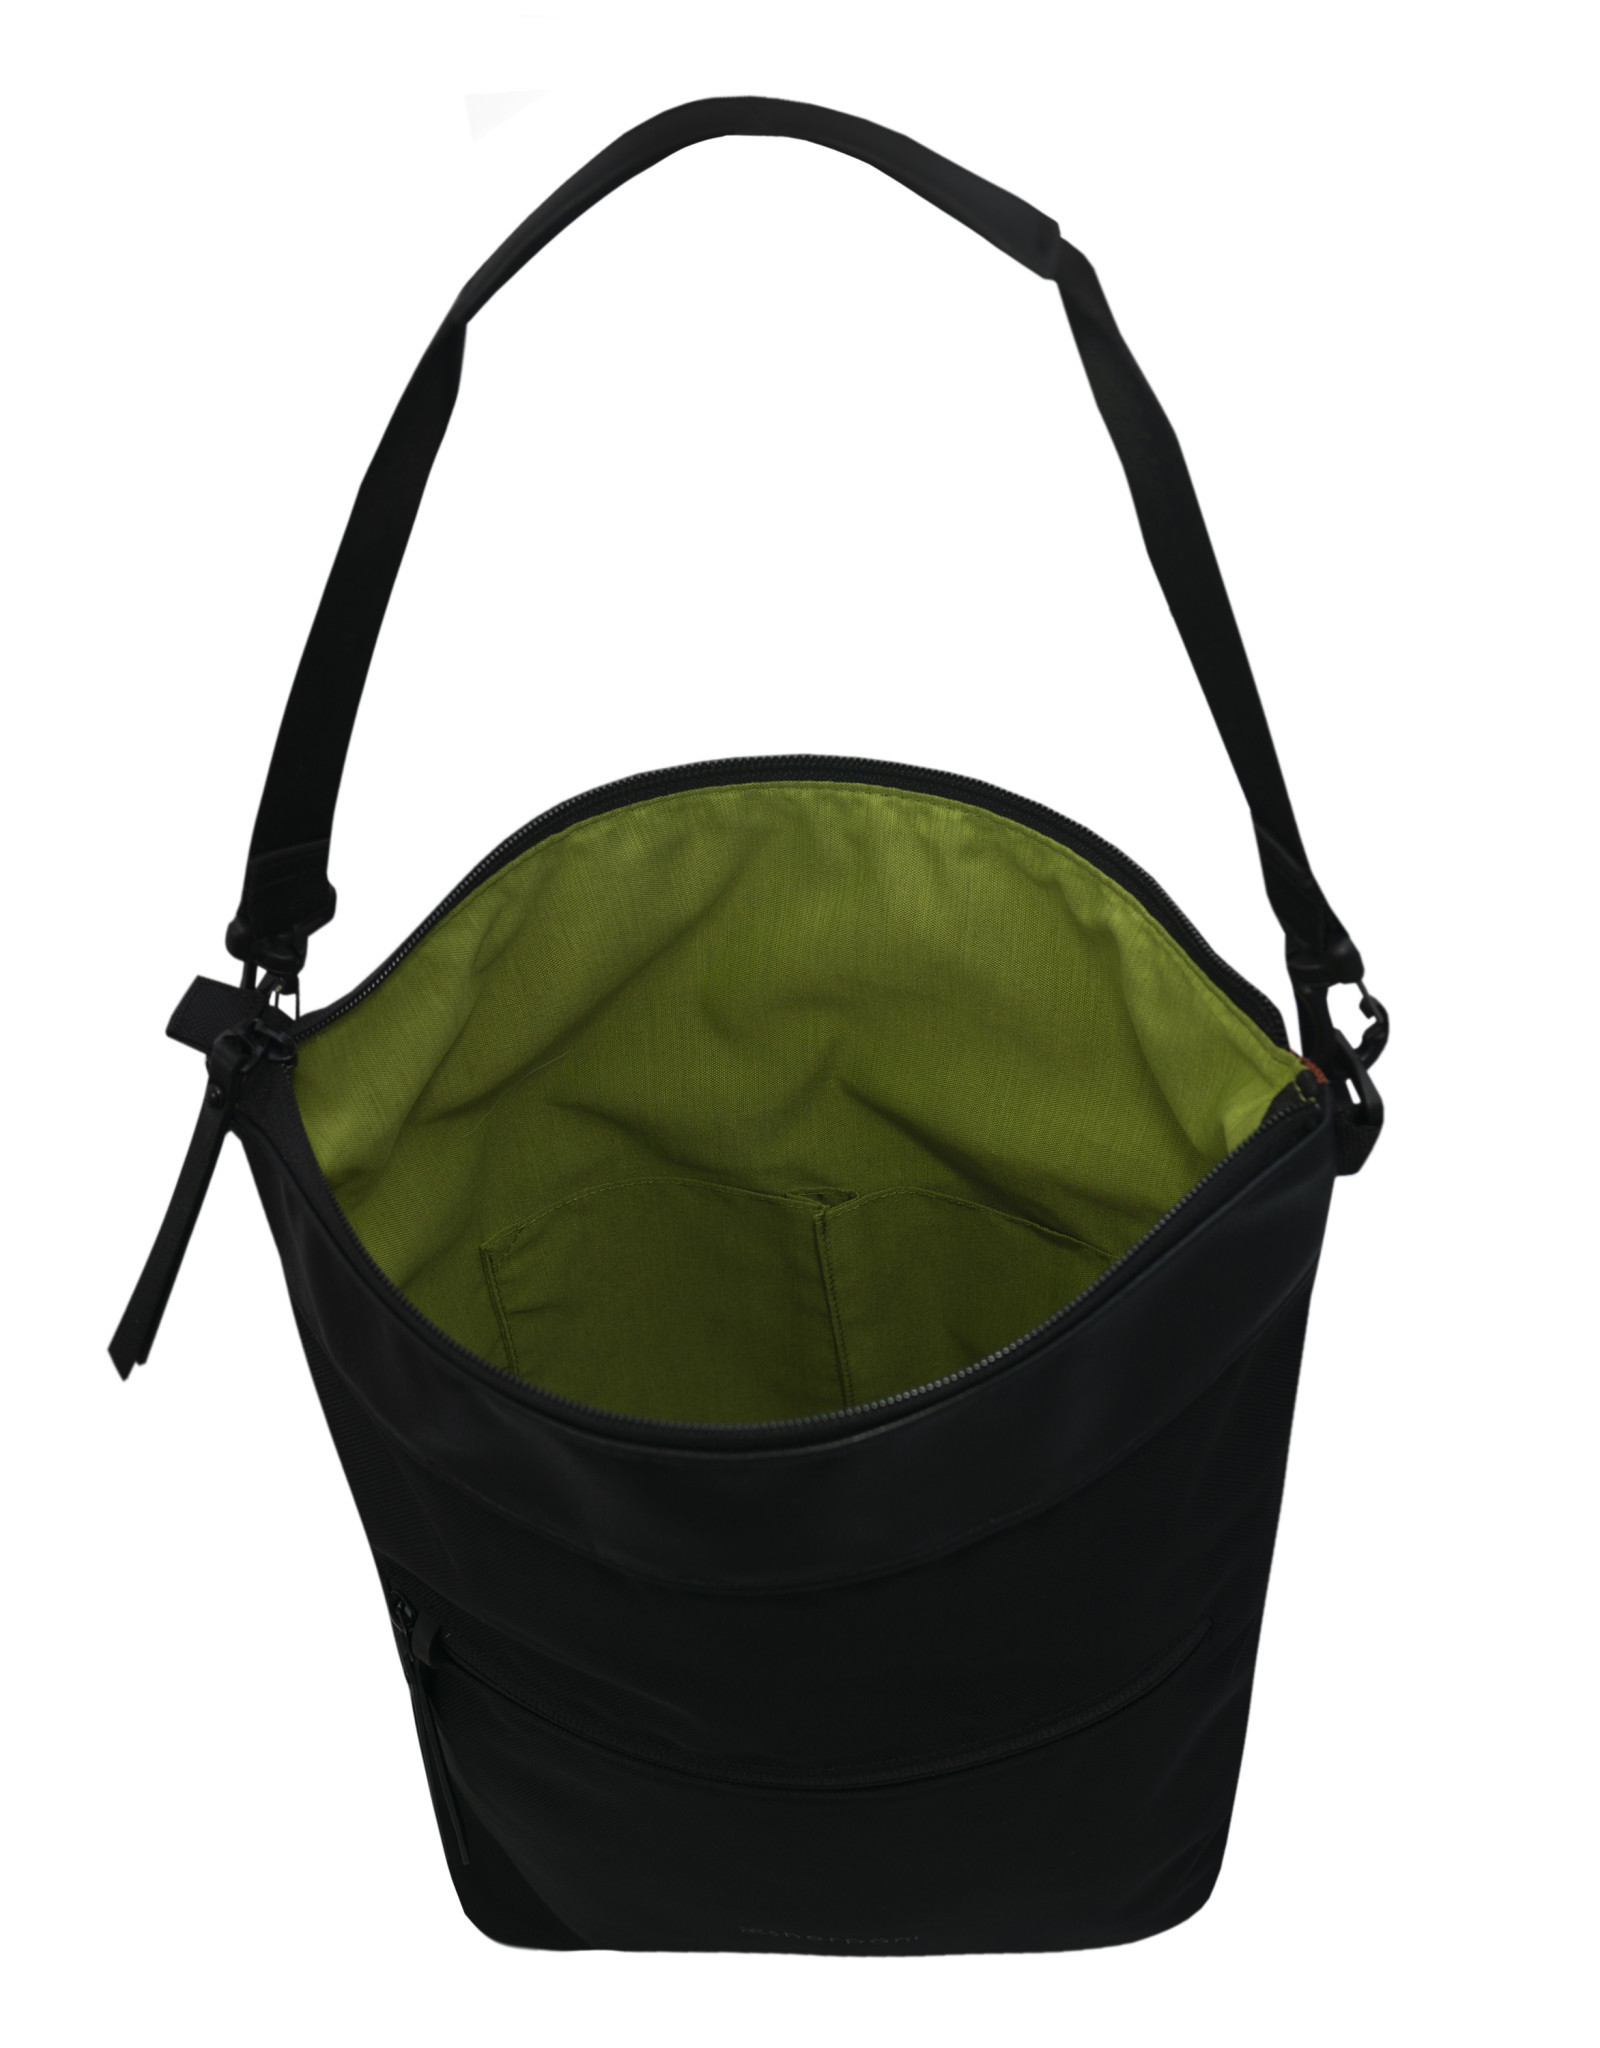 Sterling Vale Bag/Purse